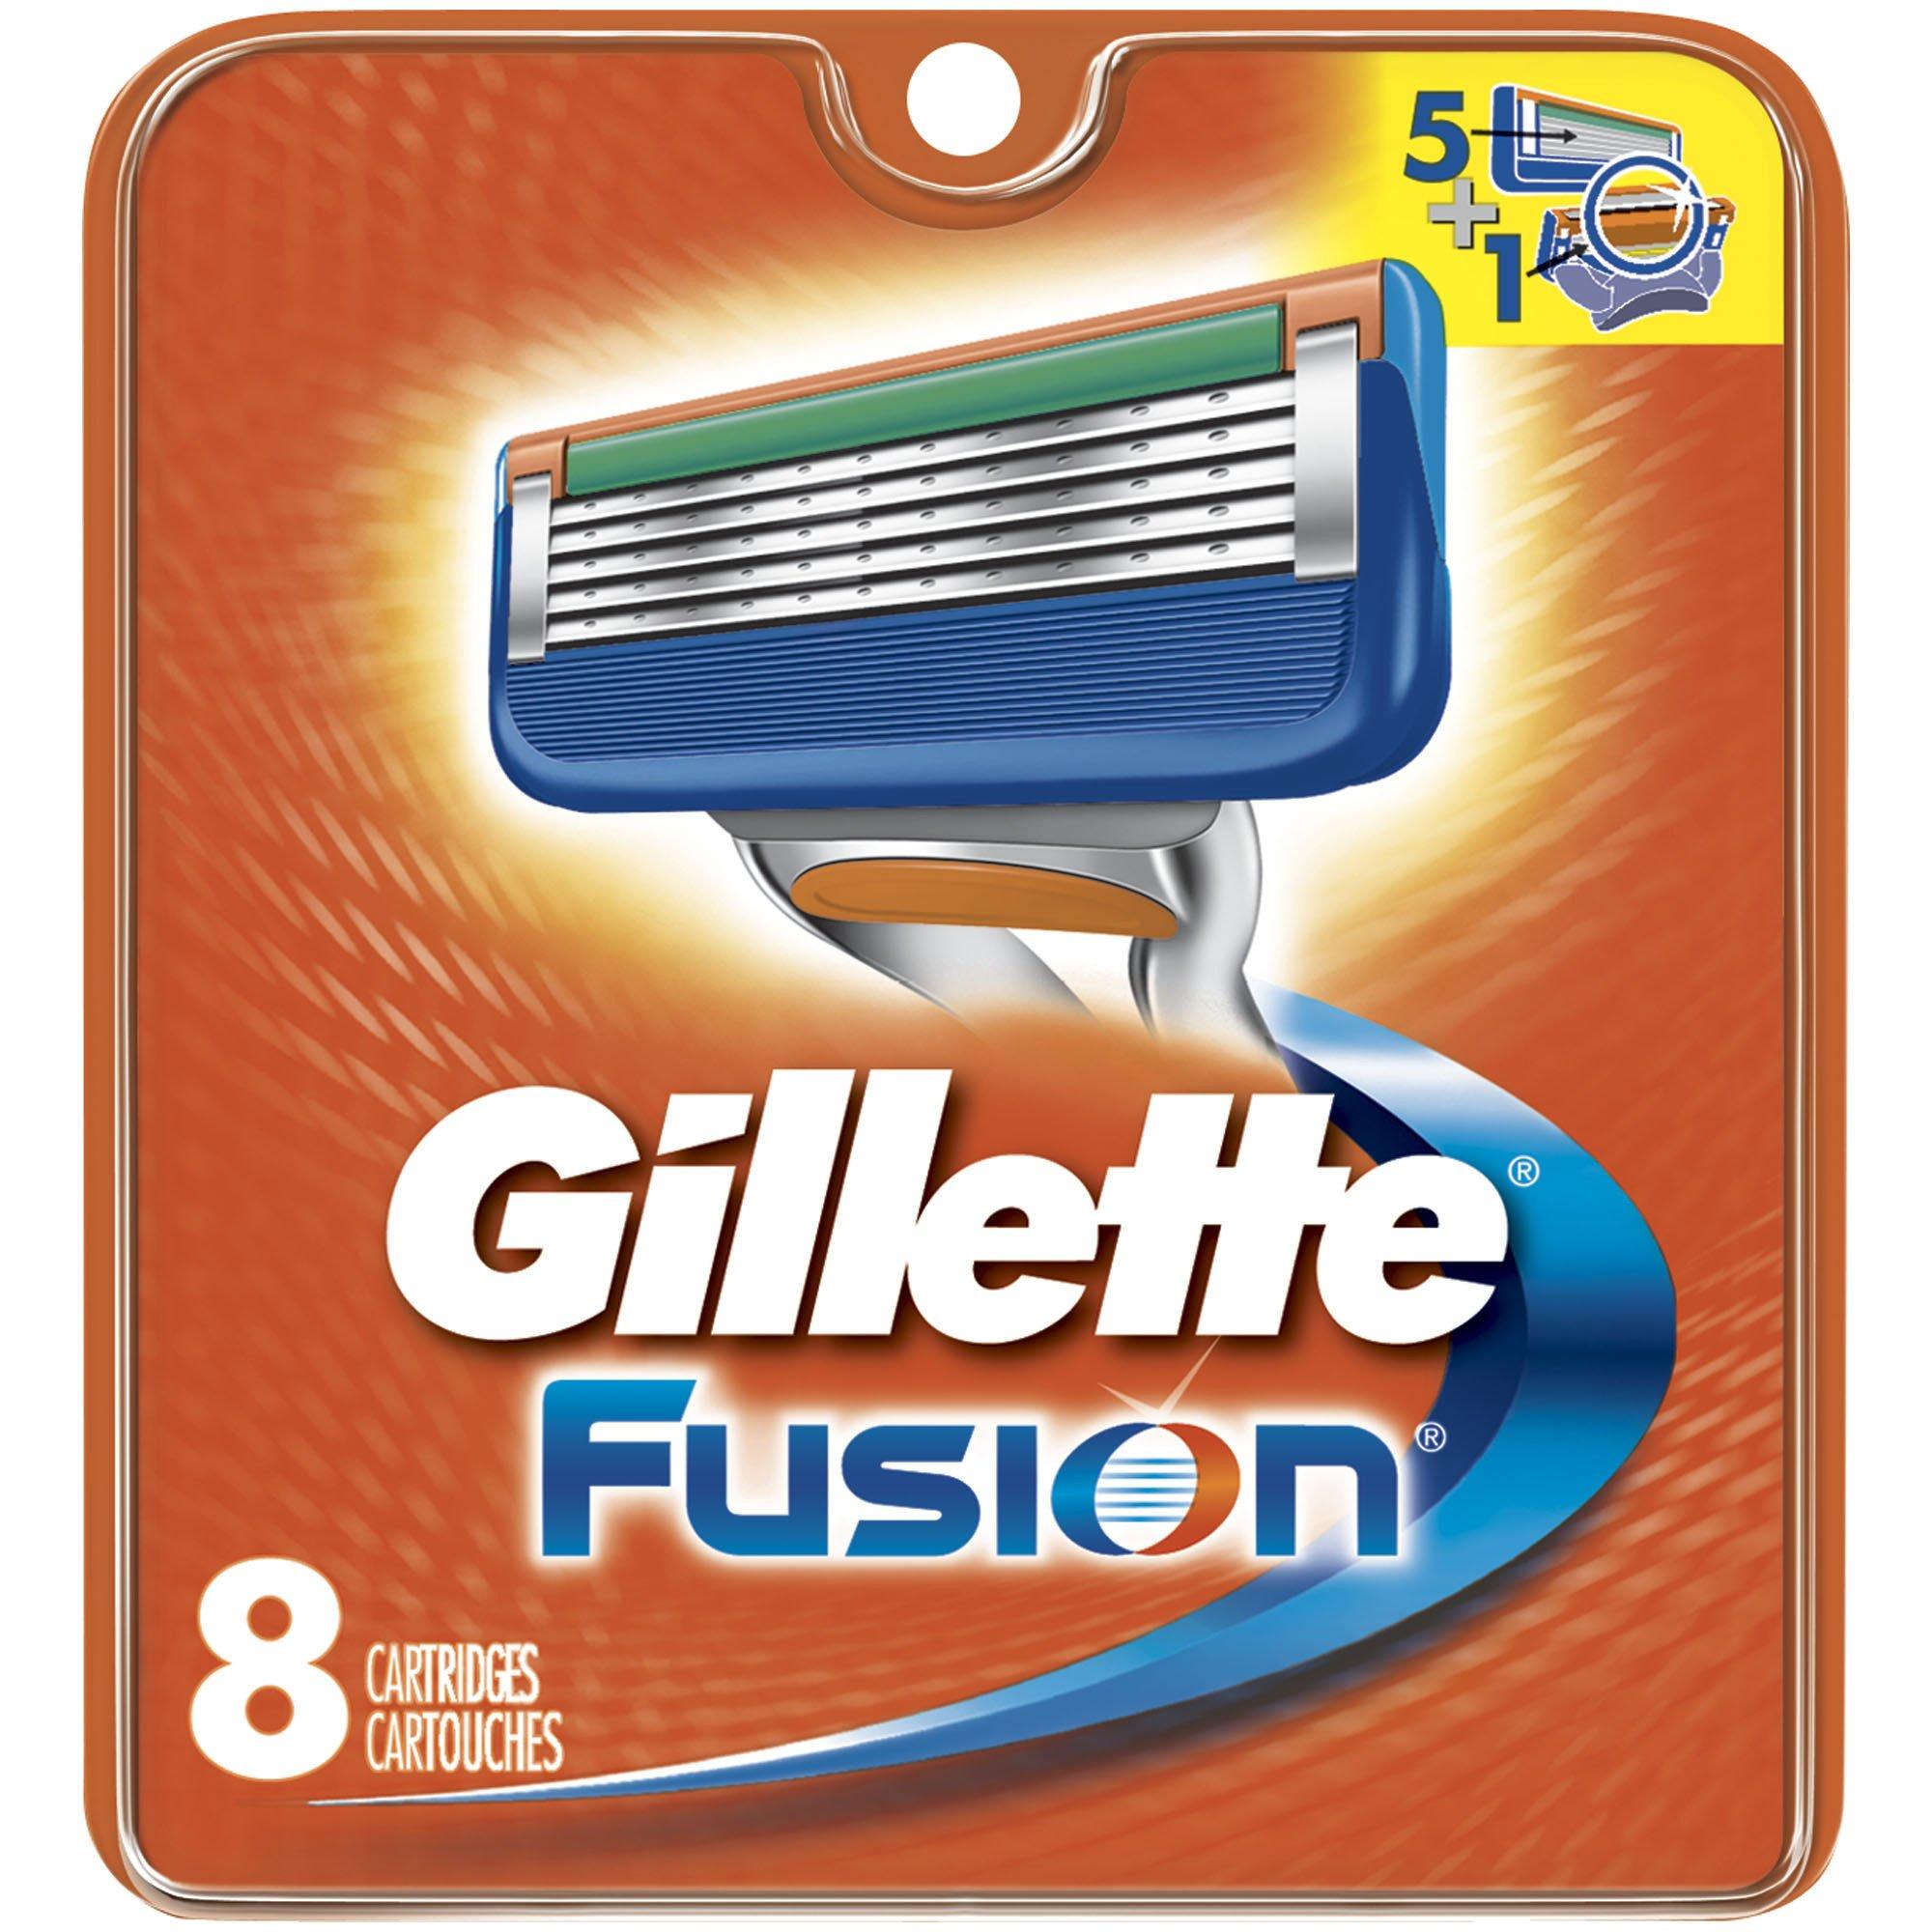 Gillette Fusion Manual Men's Razor Blade Refills, 8 Count, Mens Razors/Blades